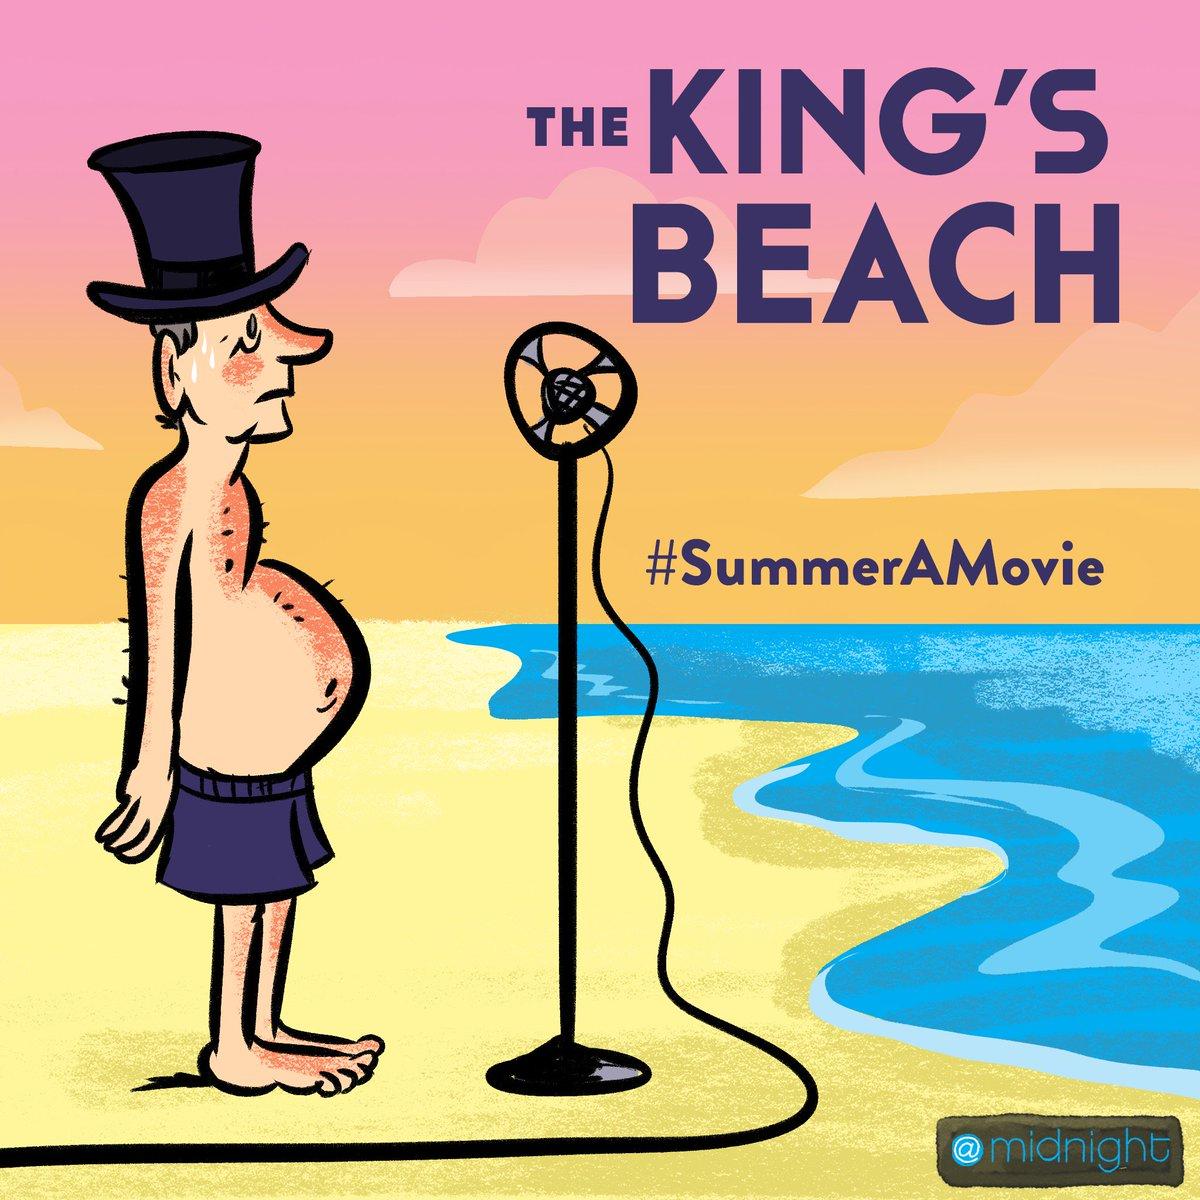 The King's Beach #SummerAMovie @midnight https://t.co/QOJXwnHgGE